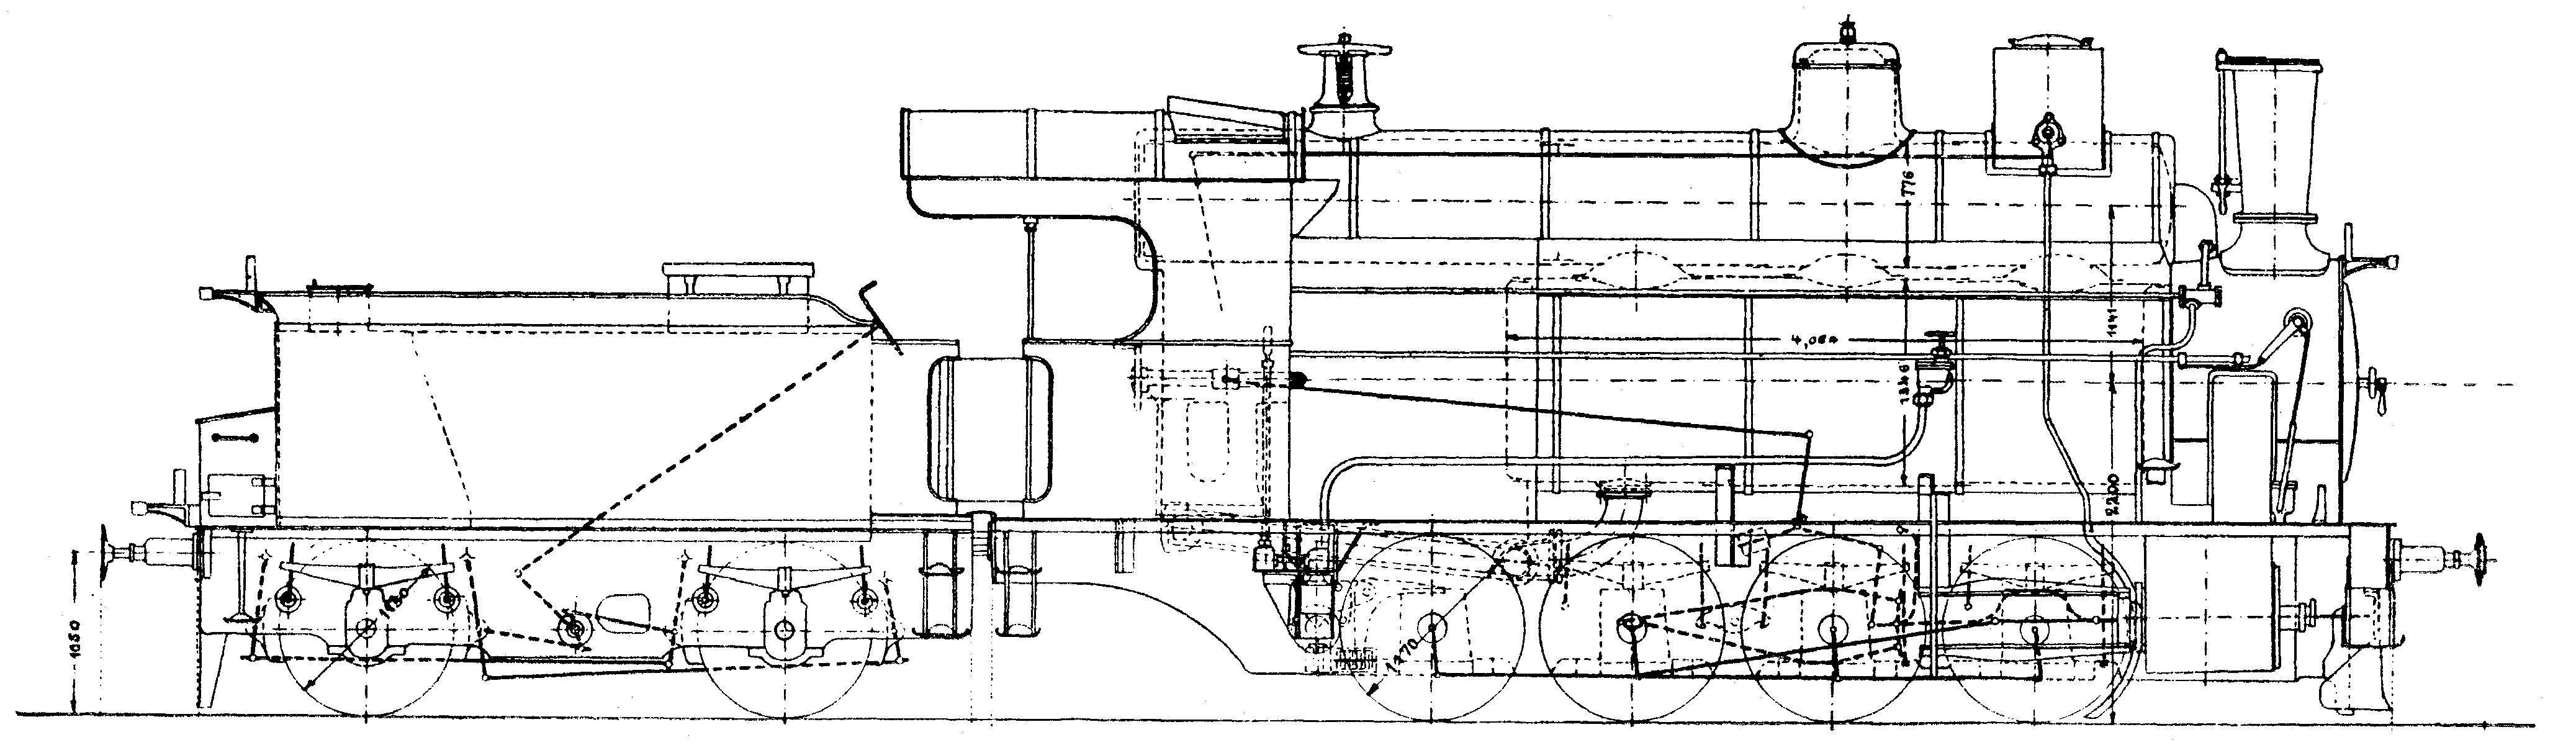 File:GB D 4-4 128 Typenskizze.PNG - Wikimedia Commons